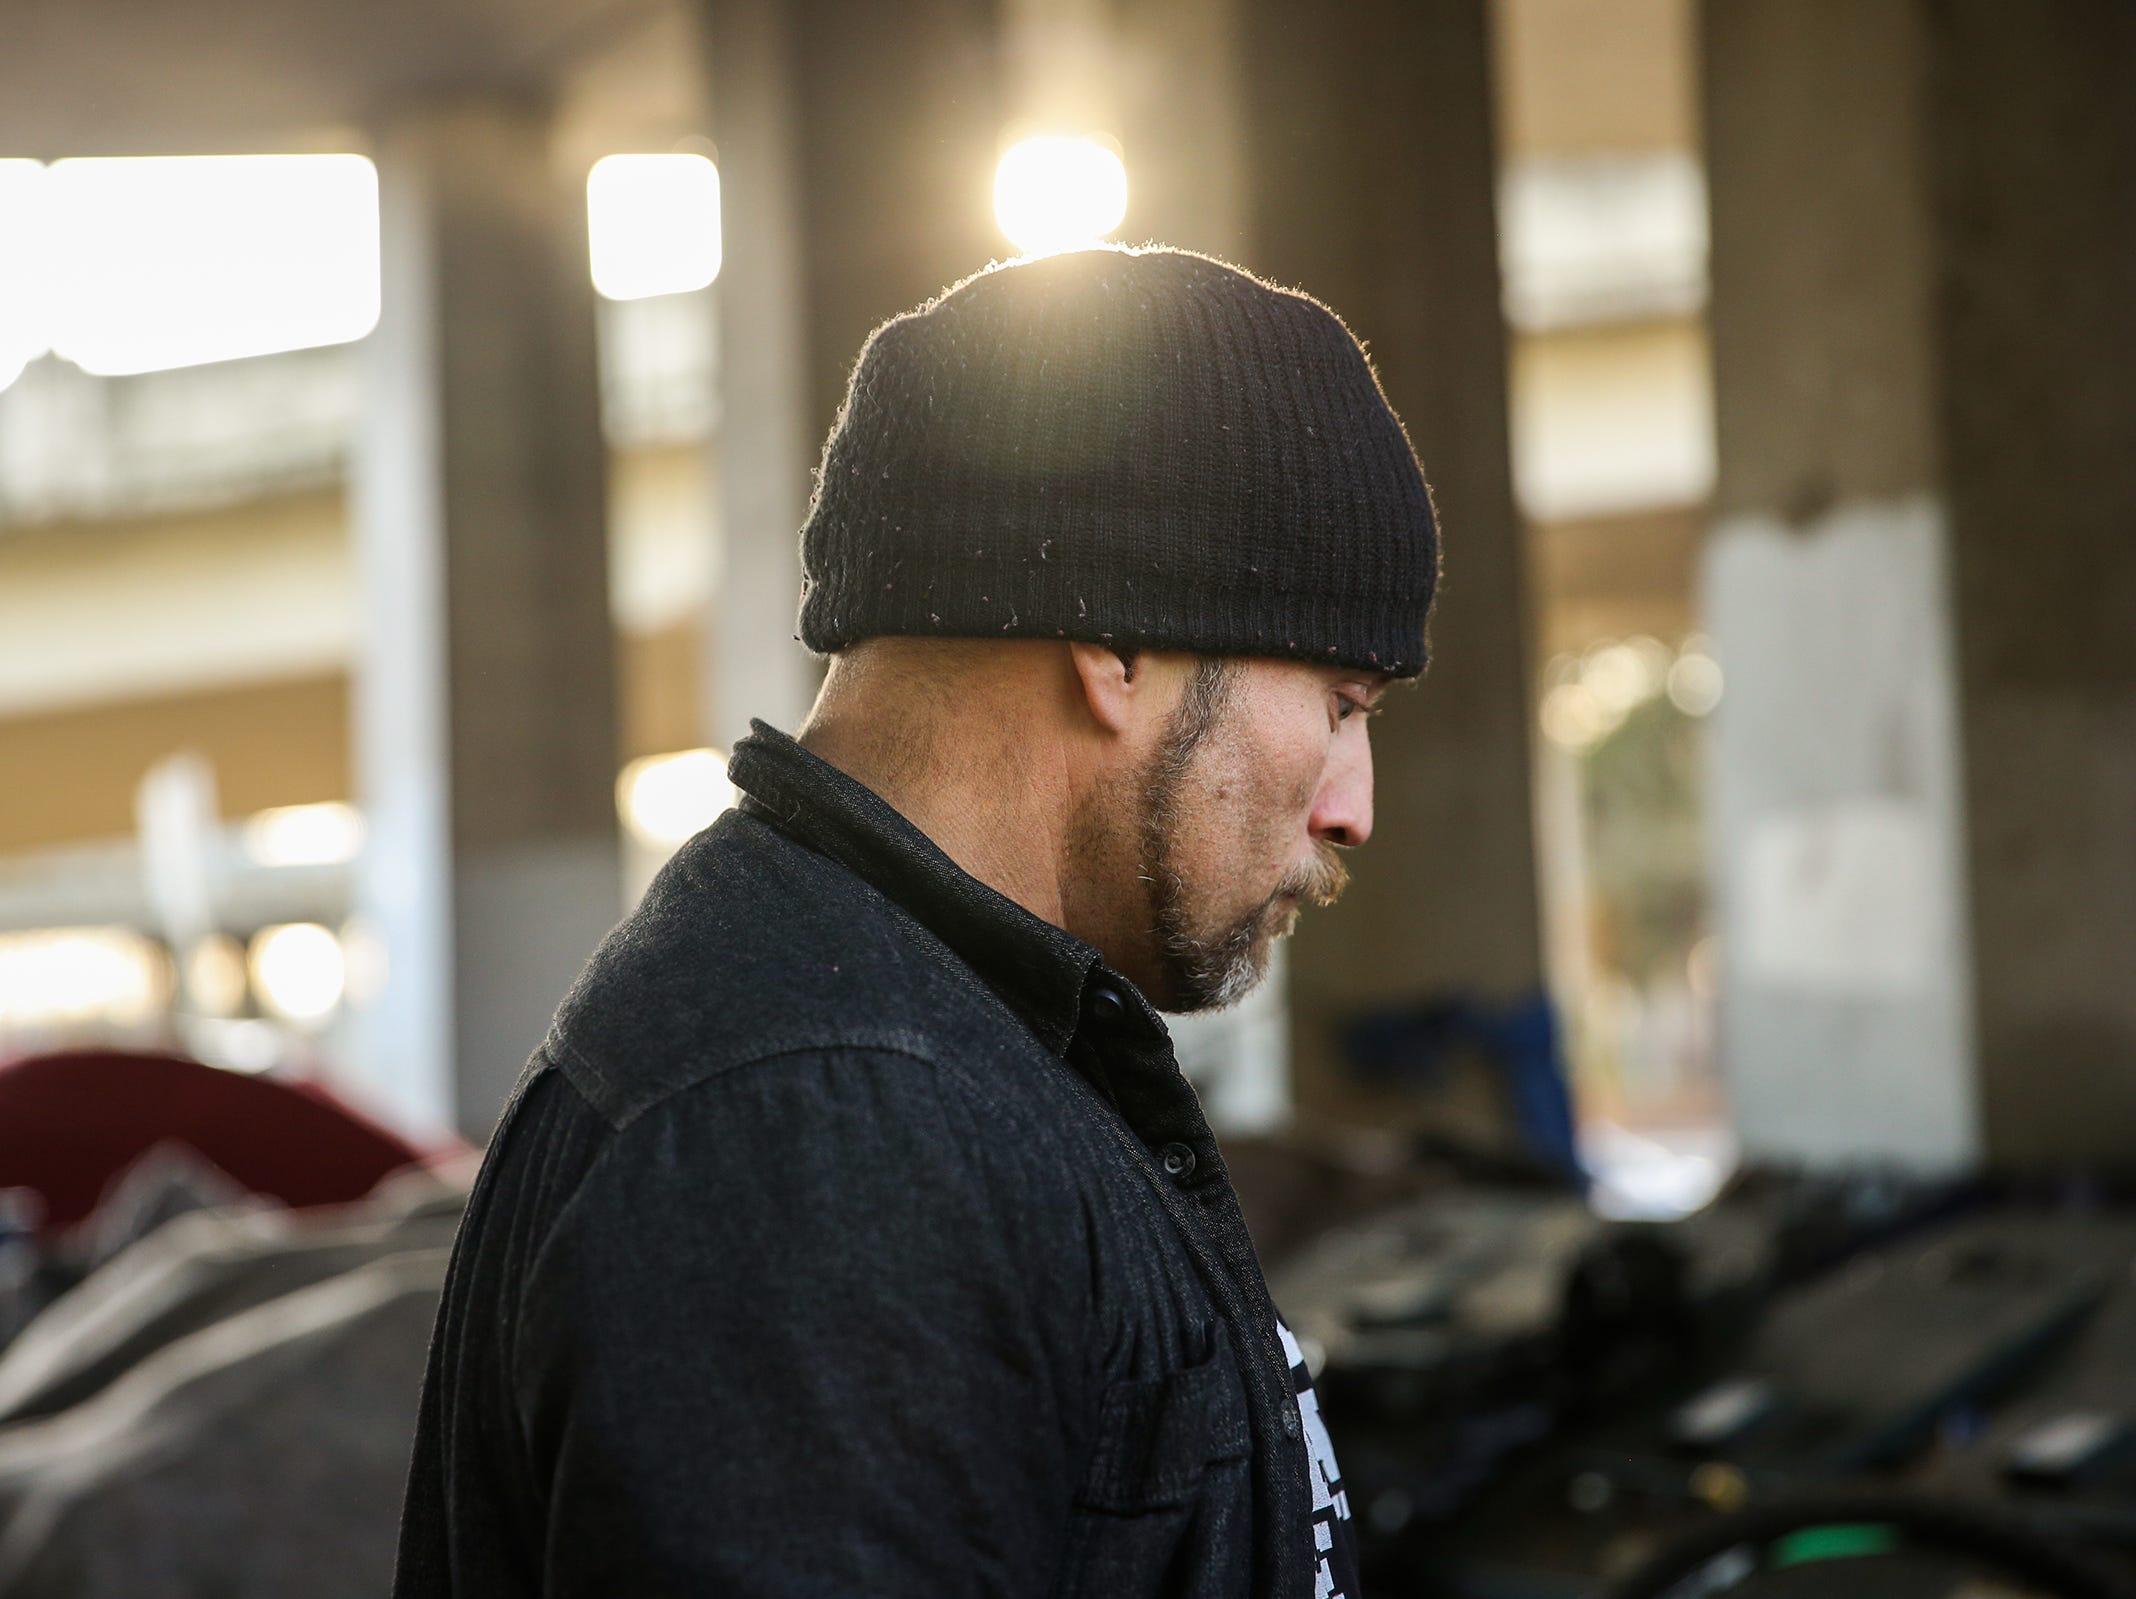 Virgil Simons, 36, at Marion Square Park under the Marion St. Bridge on Front St. NE in Salem on Thursday, Jan. 10, 2019. Simmons has been homeless in Salem for 23 years.